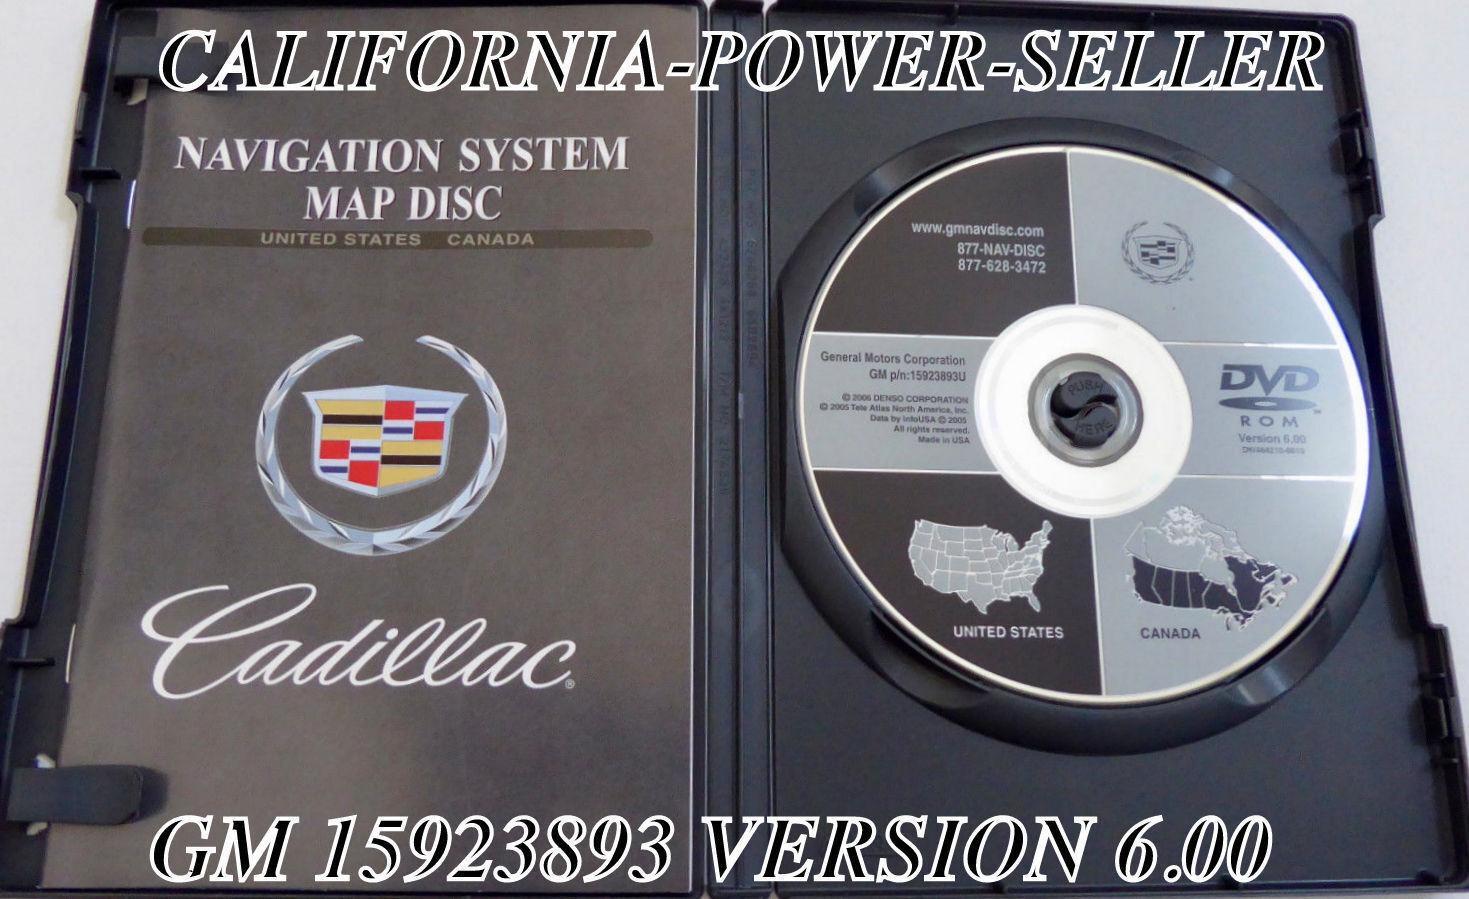 2004 2005 2006 2007 Cadillac DHS DTS Navigation Disc DVD CD 15923893